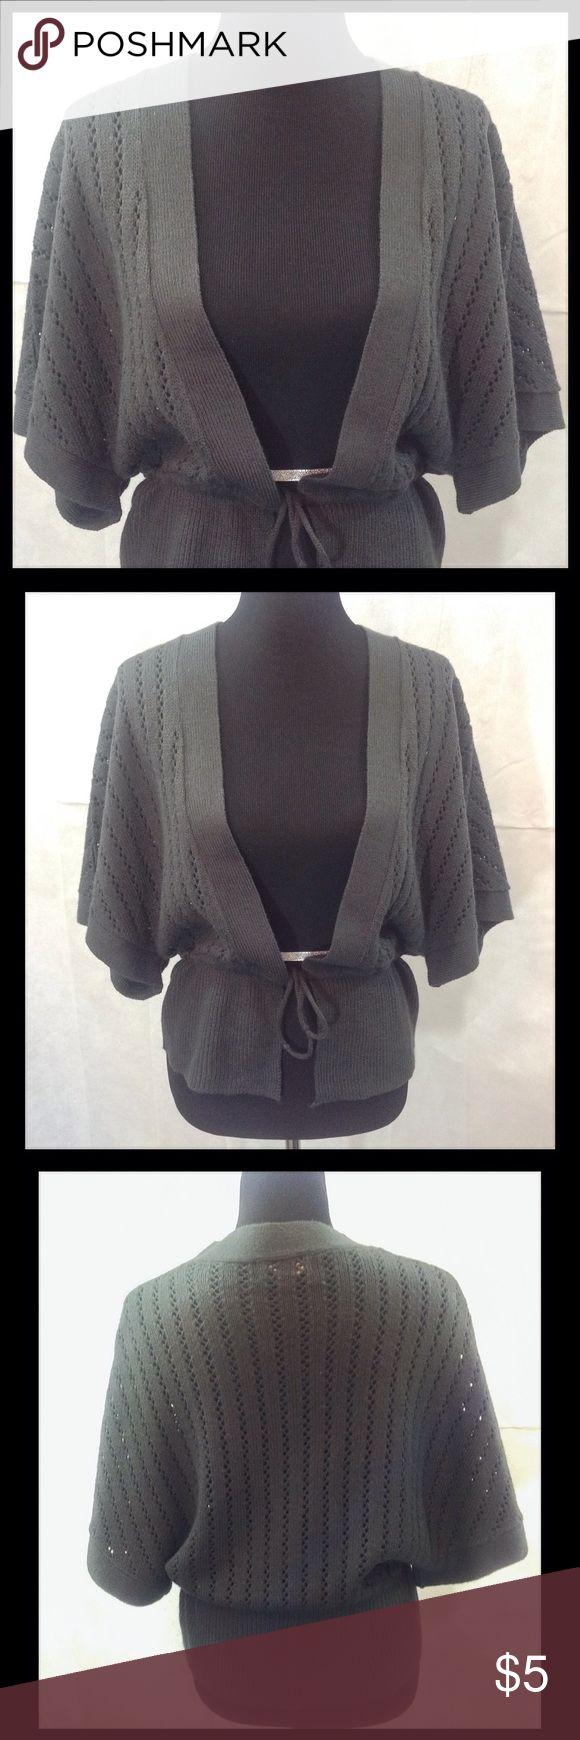 Grey Shrug Sweater Grey shrug sweater. Drawstring belted waist. GUC. 100% acrylic. Hand wash cold. Sweaters Shrugs & Ponchos